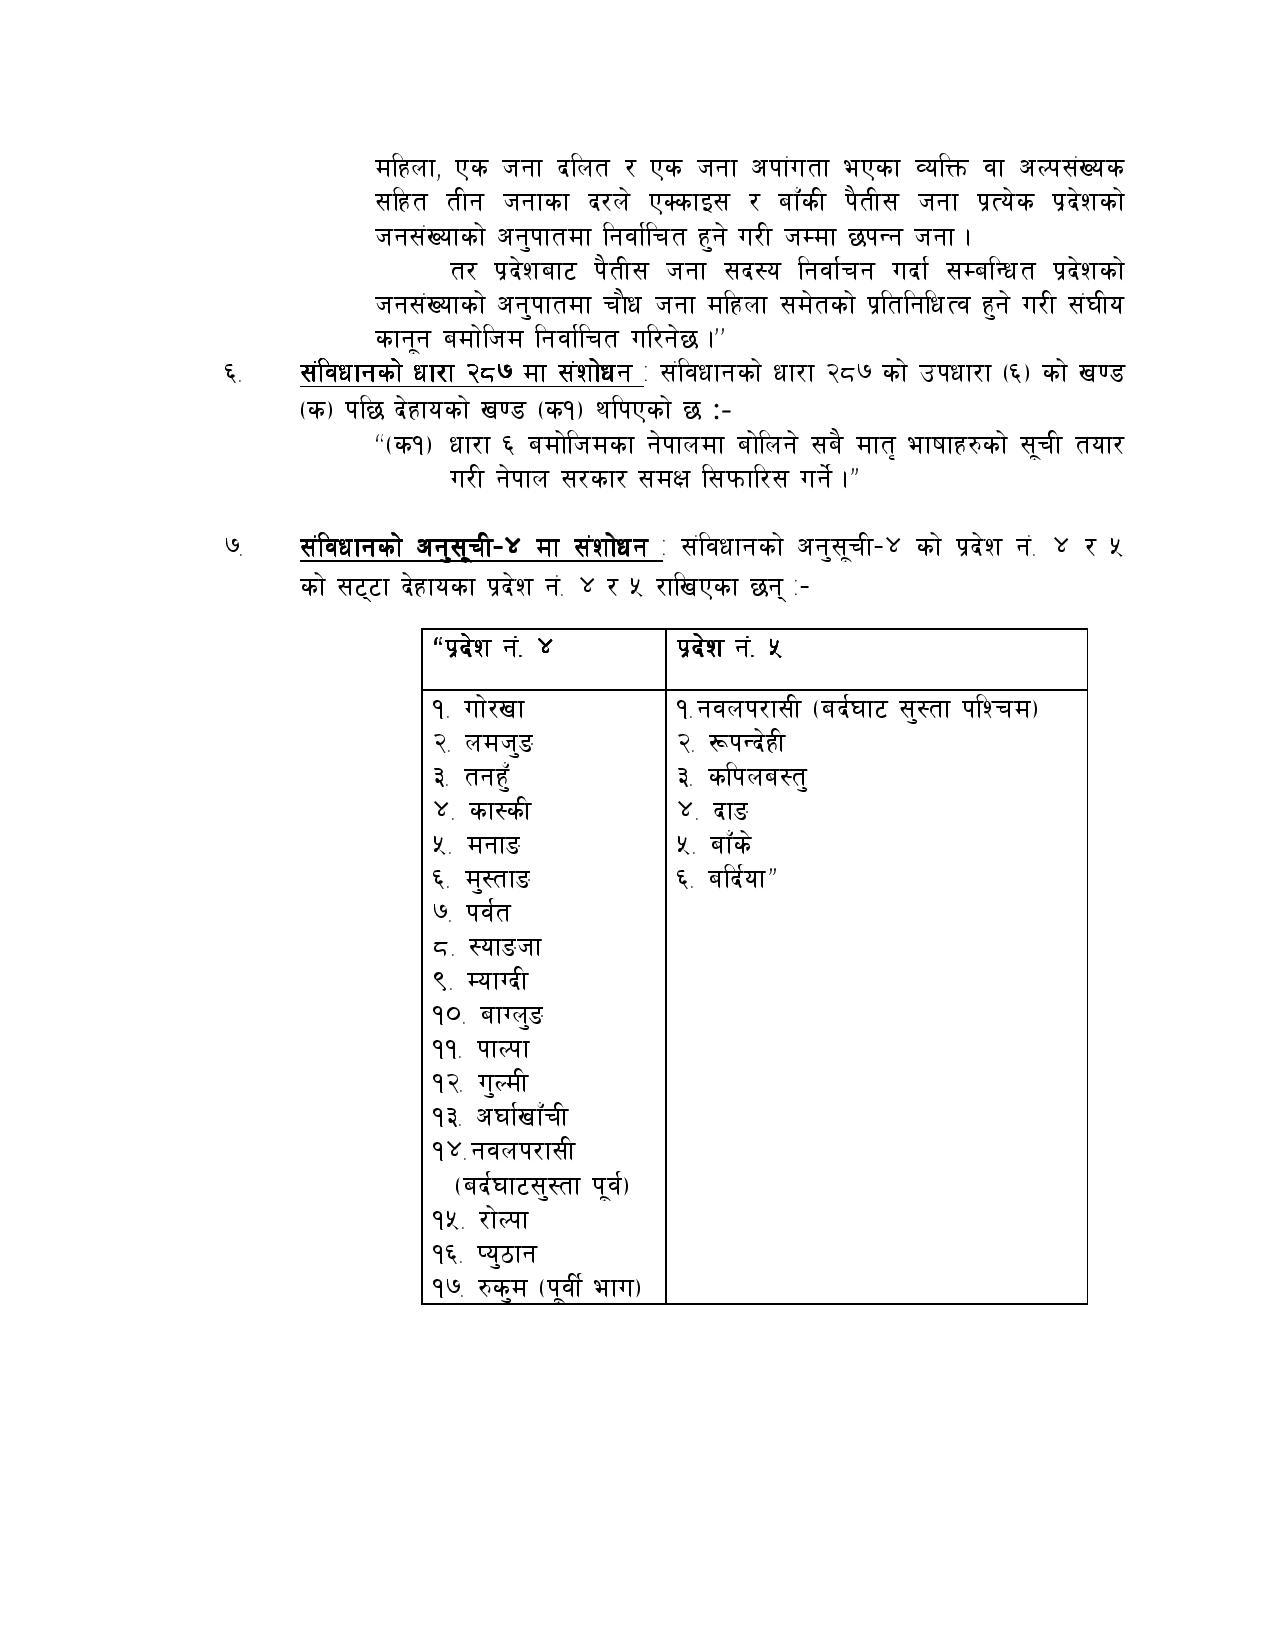 amendment-final-page-002